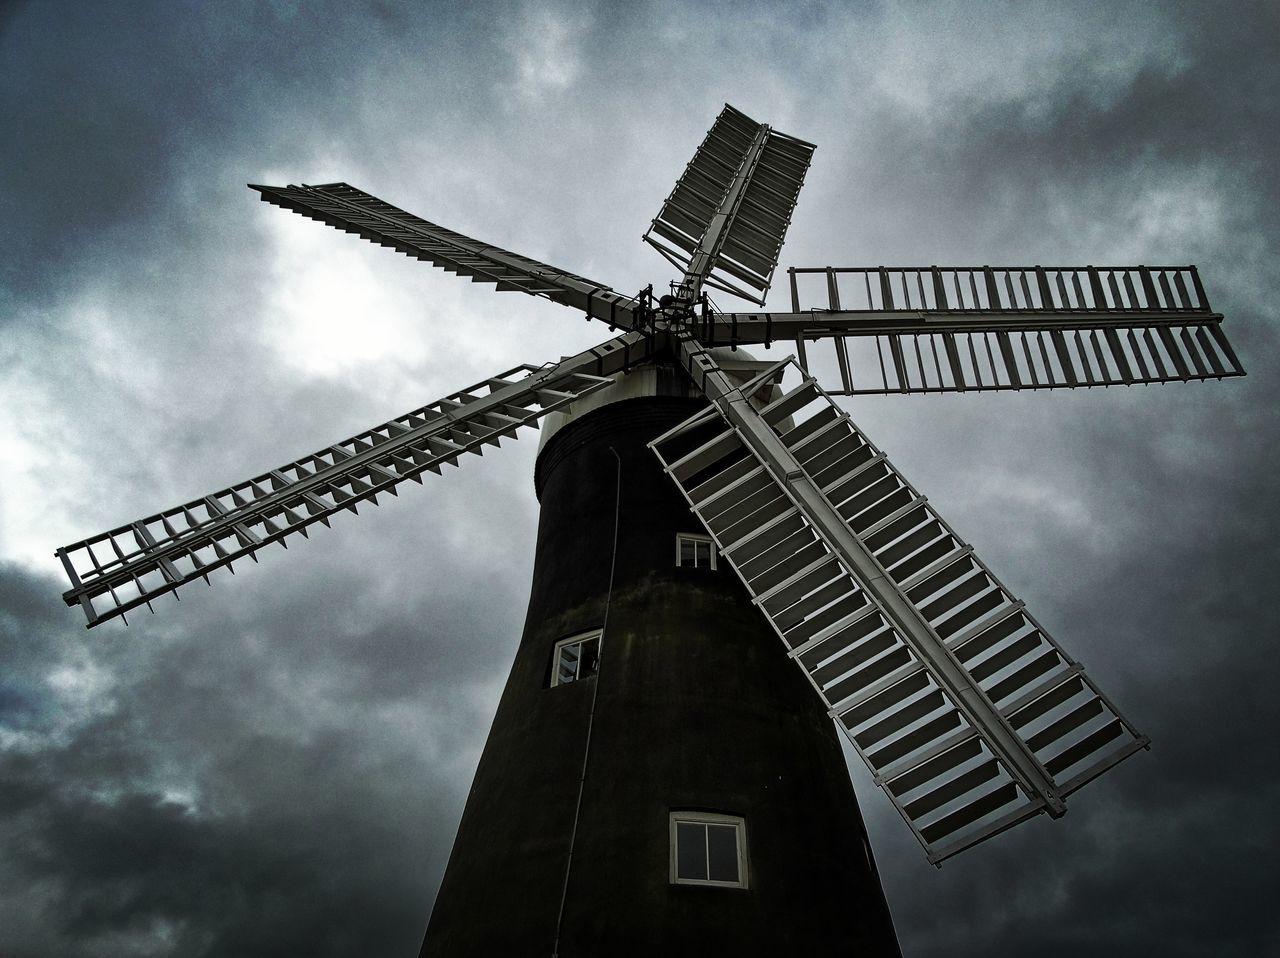 First Eyeem Photo Windmill Clouds Storm Mill Building